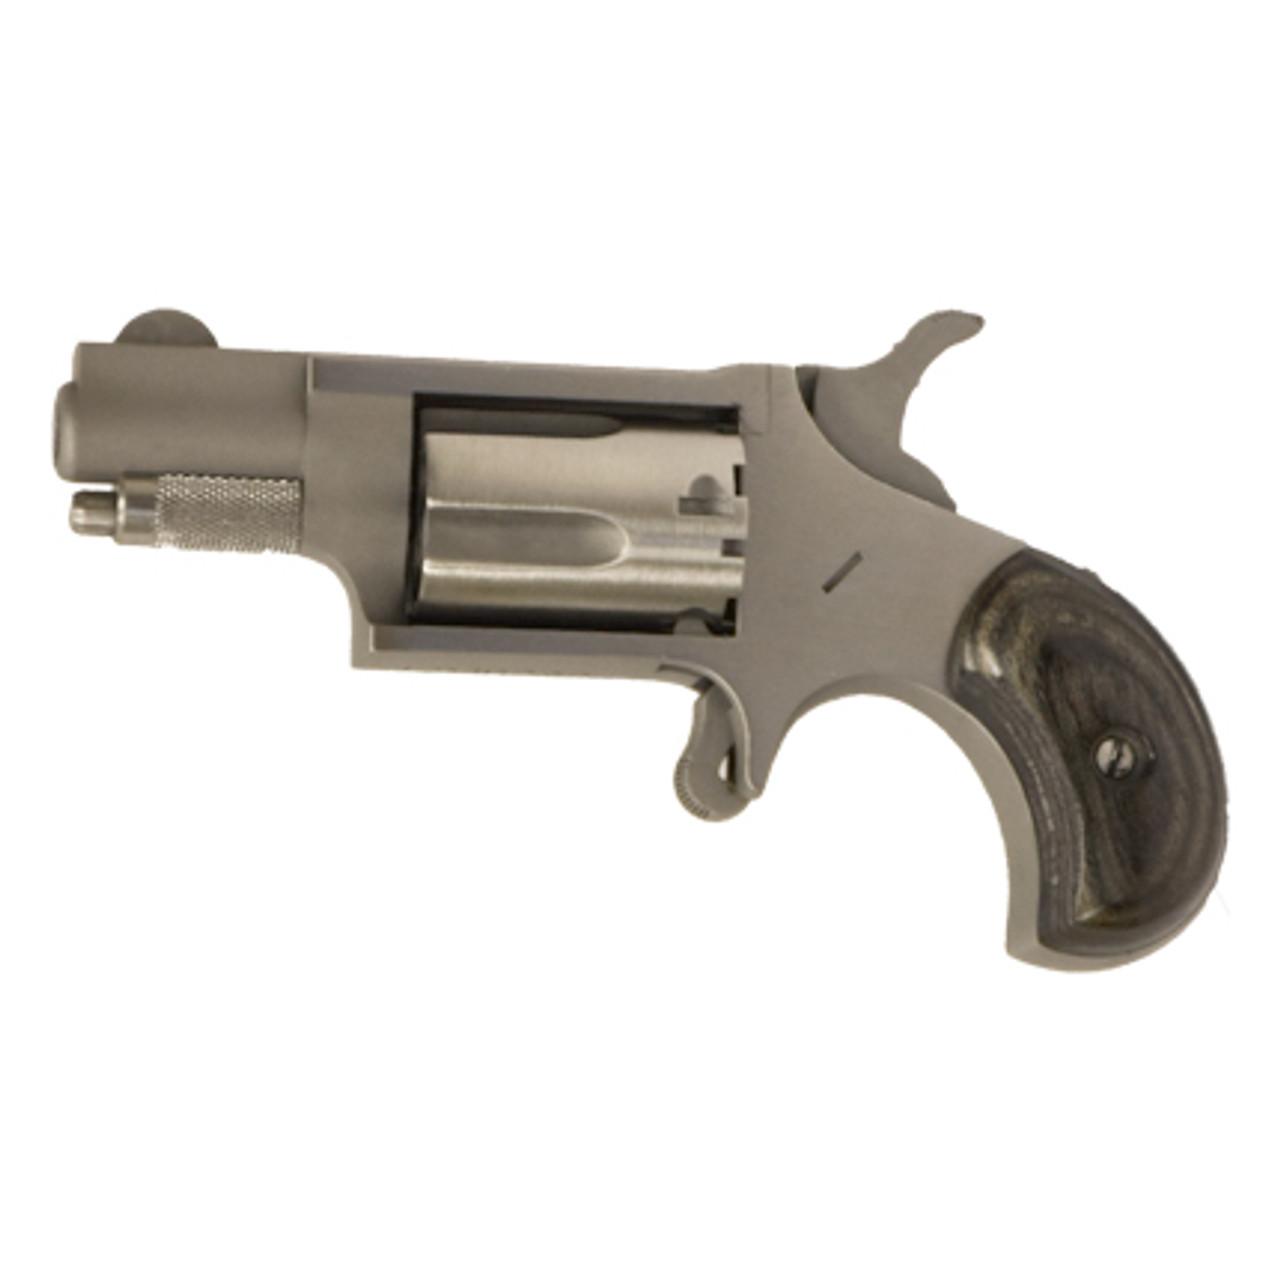 North American Arms BBS-L Skeleton Belt Buckle Holster For Standard Long Rifles